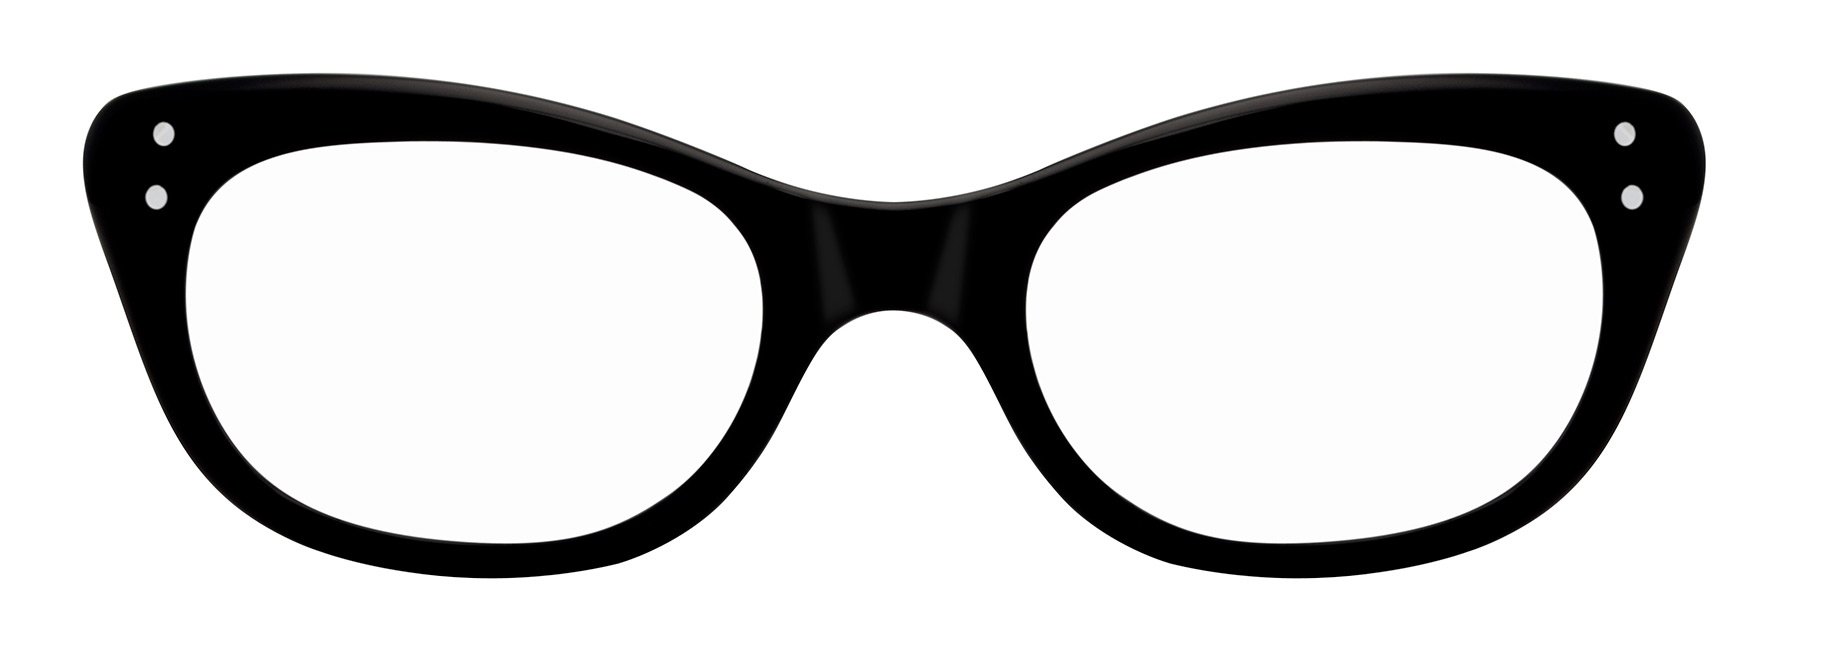 moscot-eyewear-ss2013-32